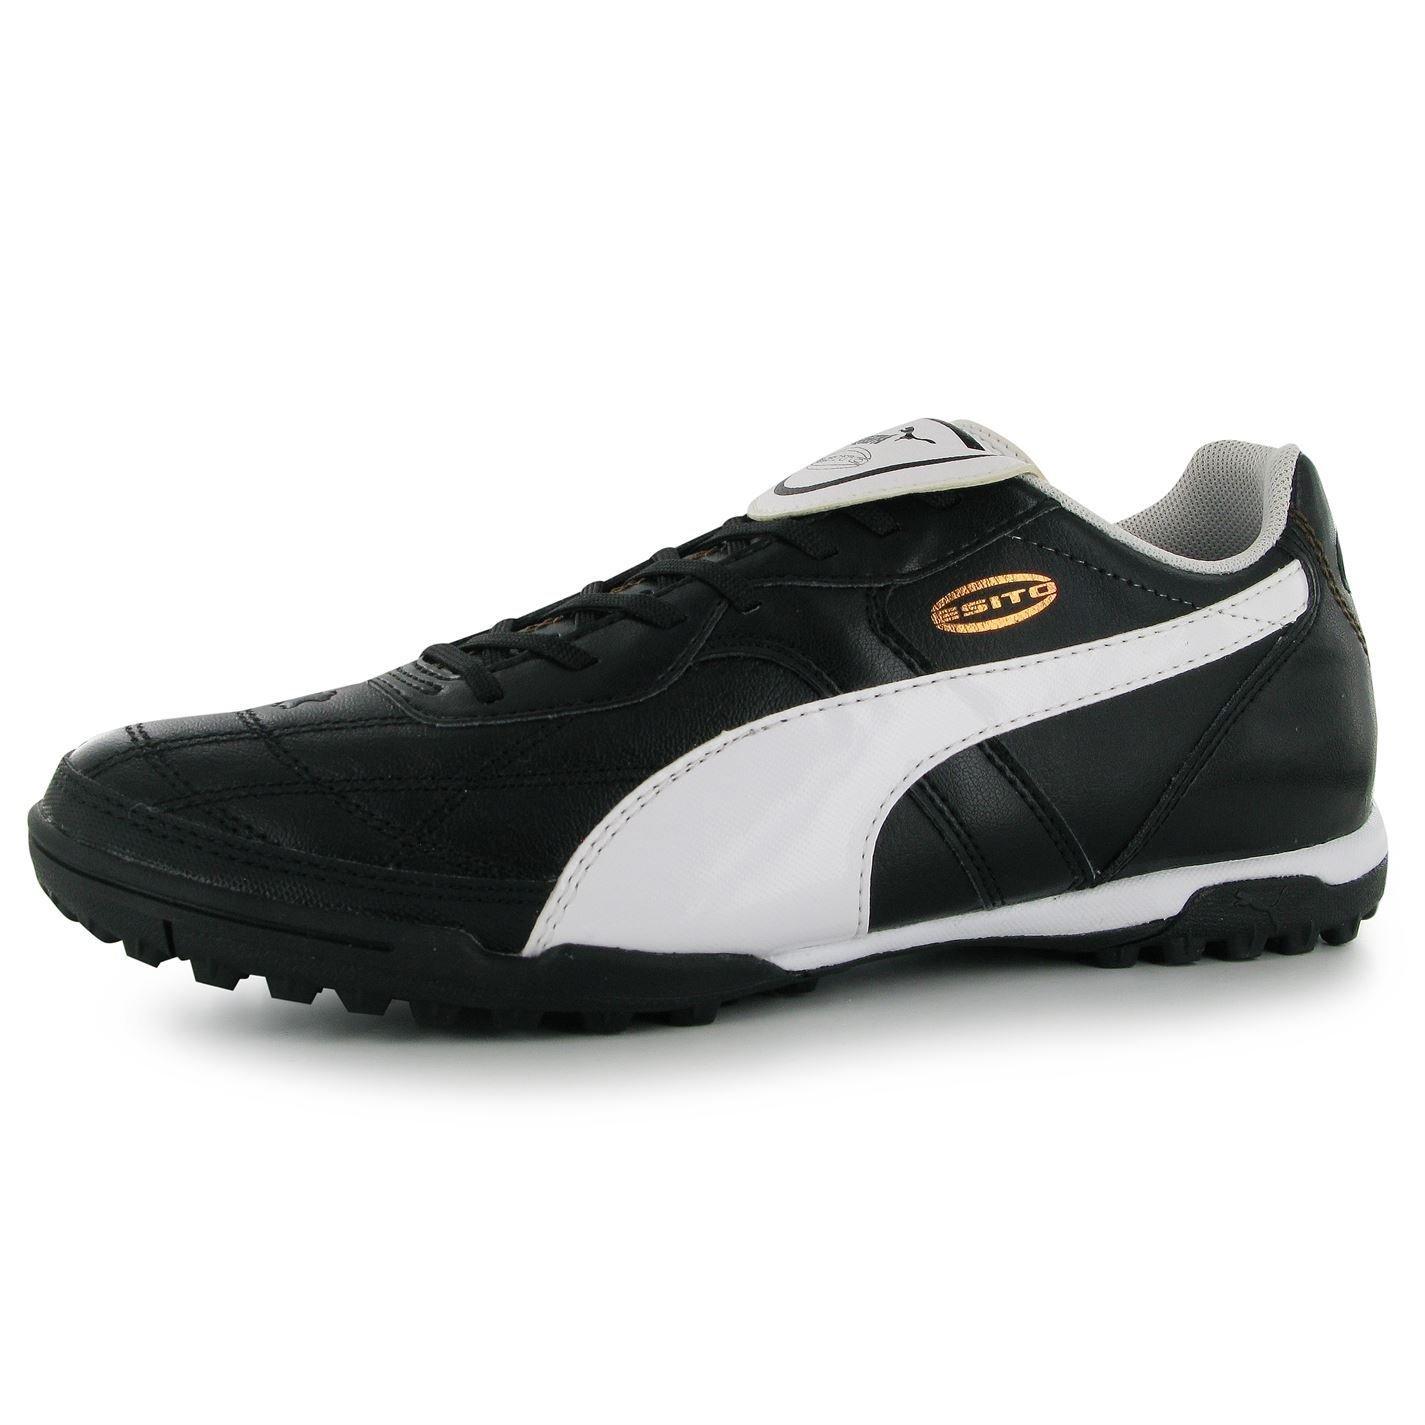 Puma Esito Classic Astro Turf Footballトレーナーメンズブラック/ホワイトサッカー靴 B01FKHL8JE(UK6) (EU39) (US7)